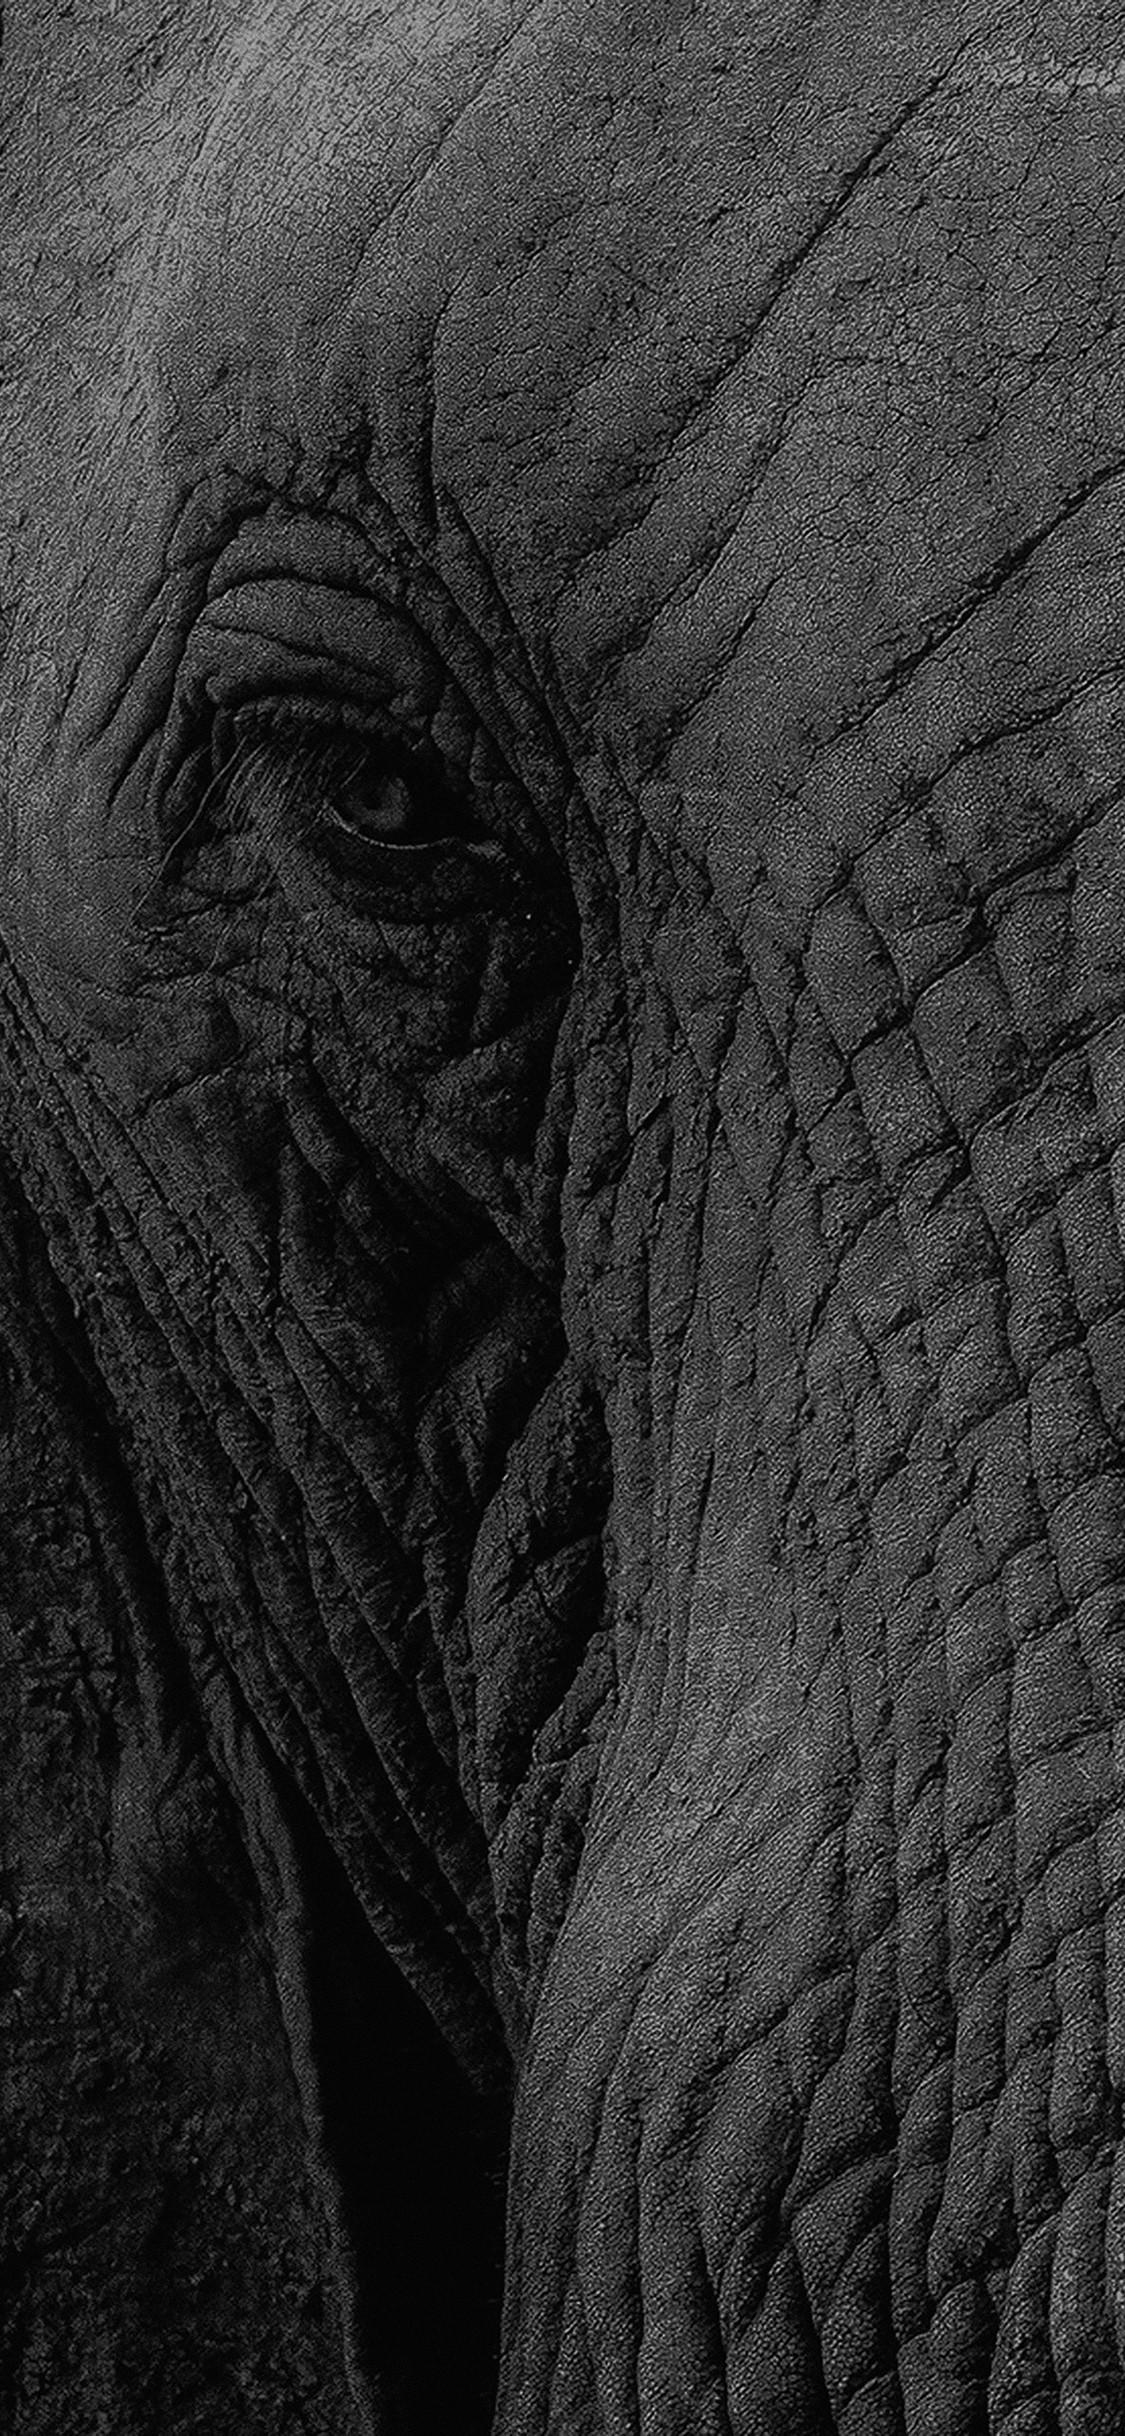 2880x1800 Wallpaperwiki Baby Elephant Wallpaper Free Download PIC